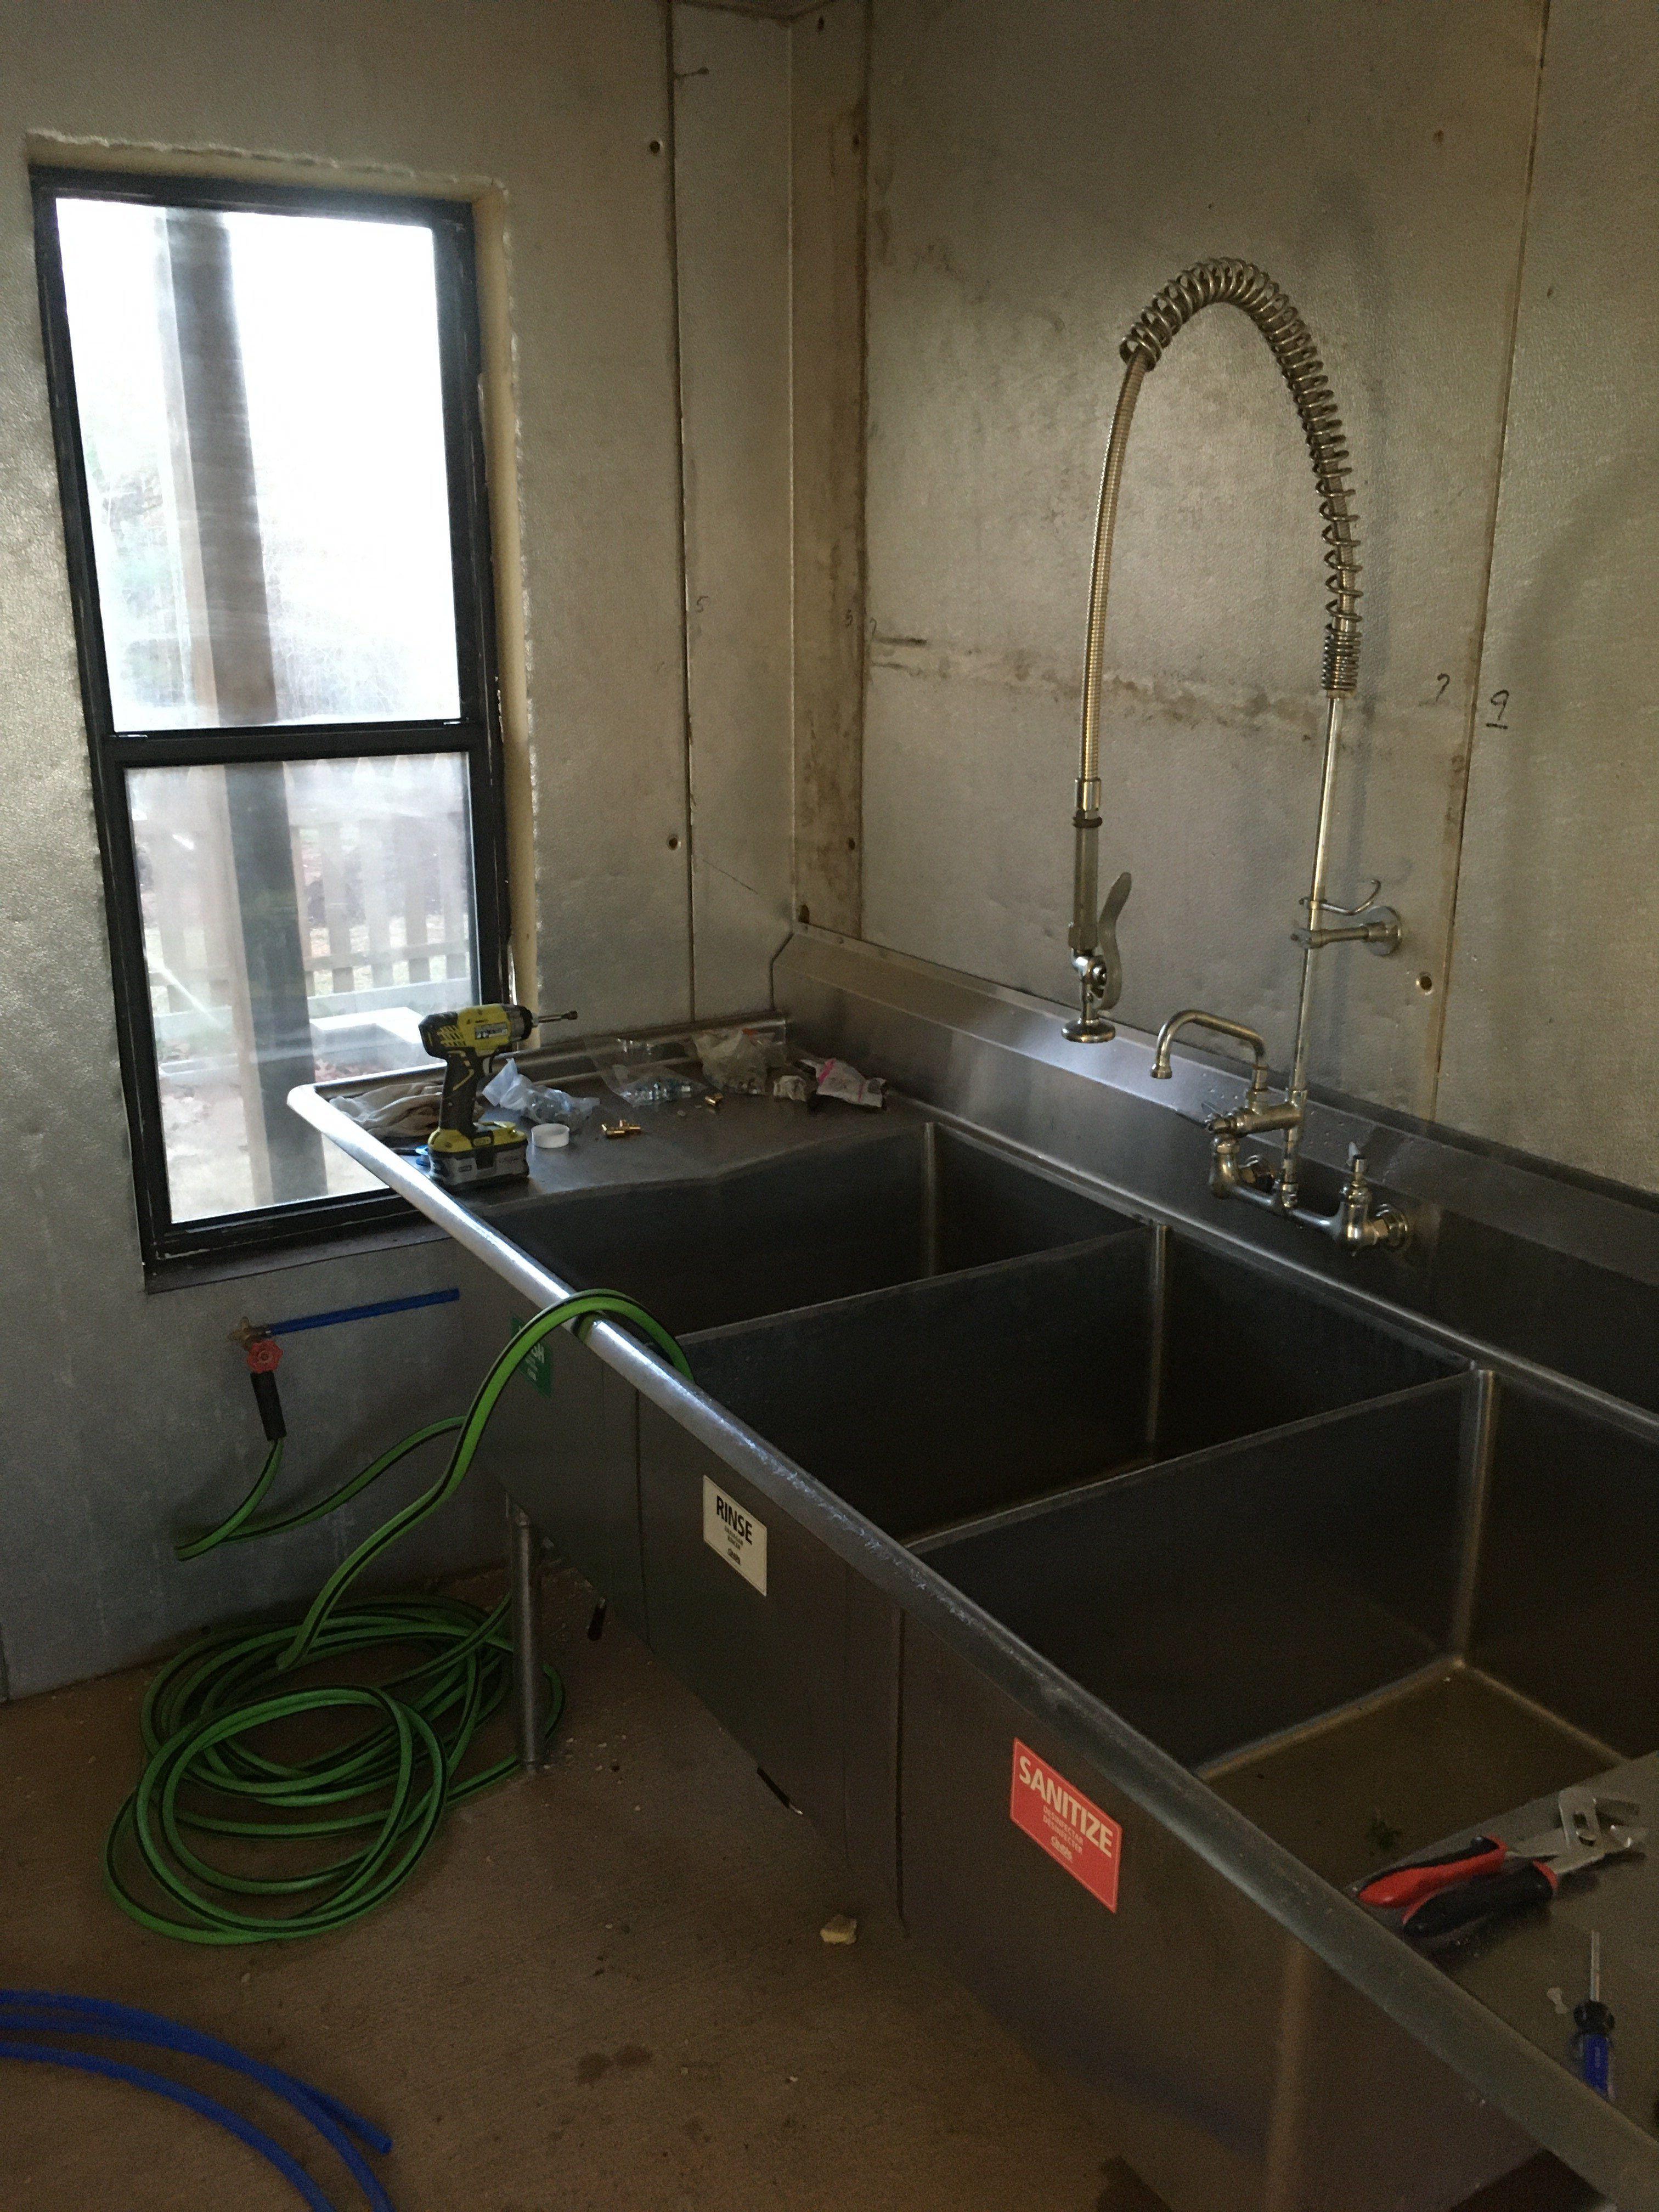 Winter Progress! Building a wash room.